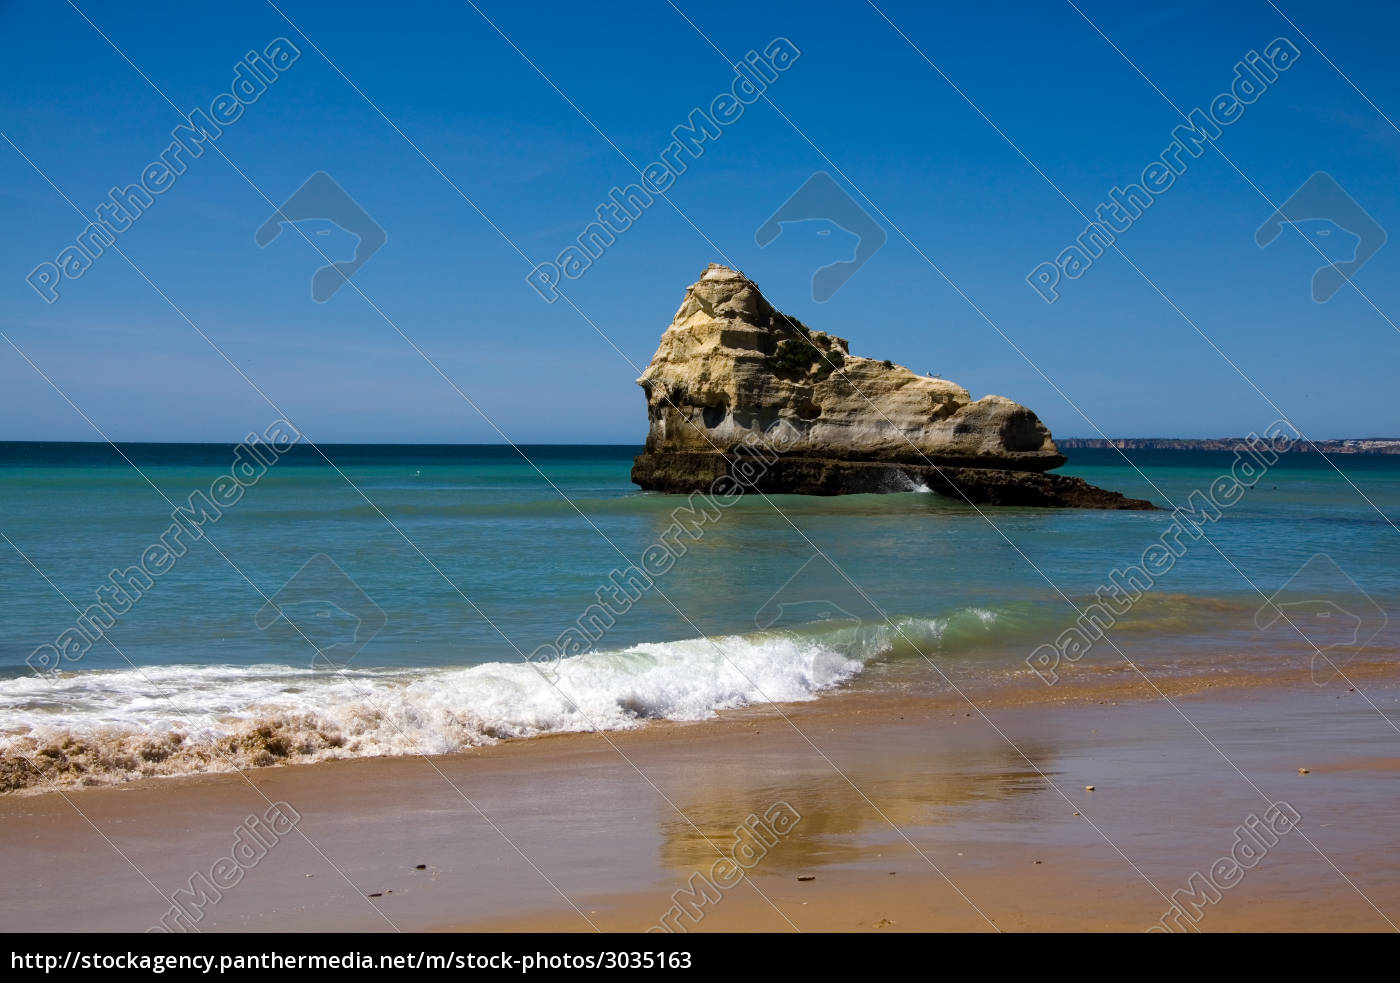 praia, da, rocha, portimao - 3035163